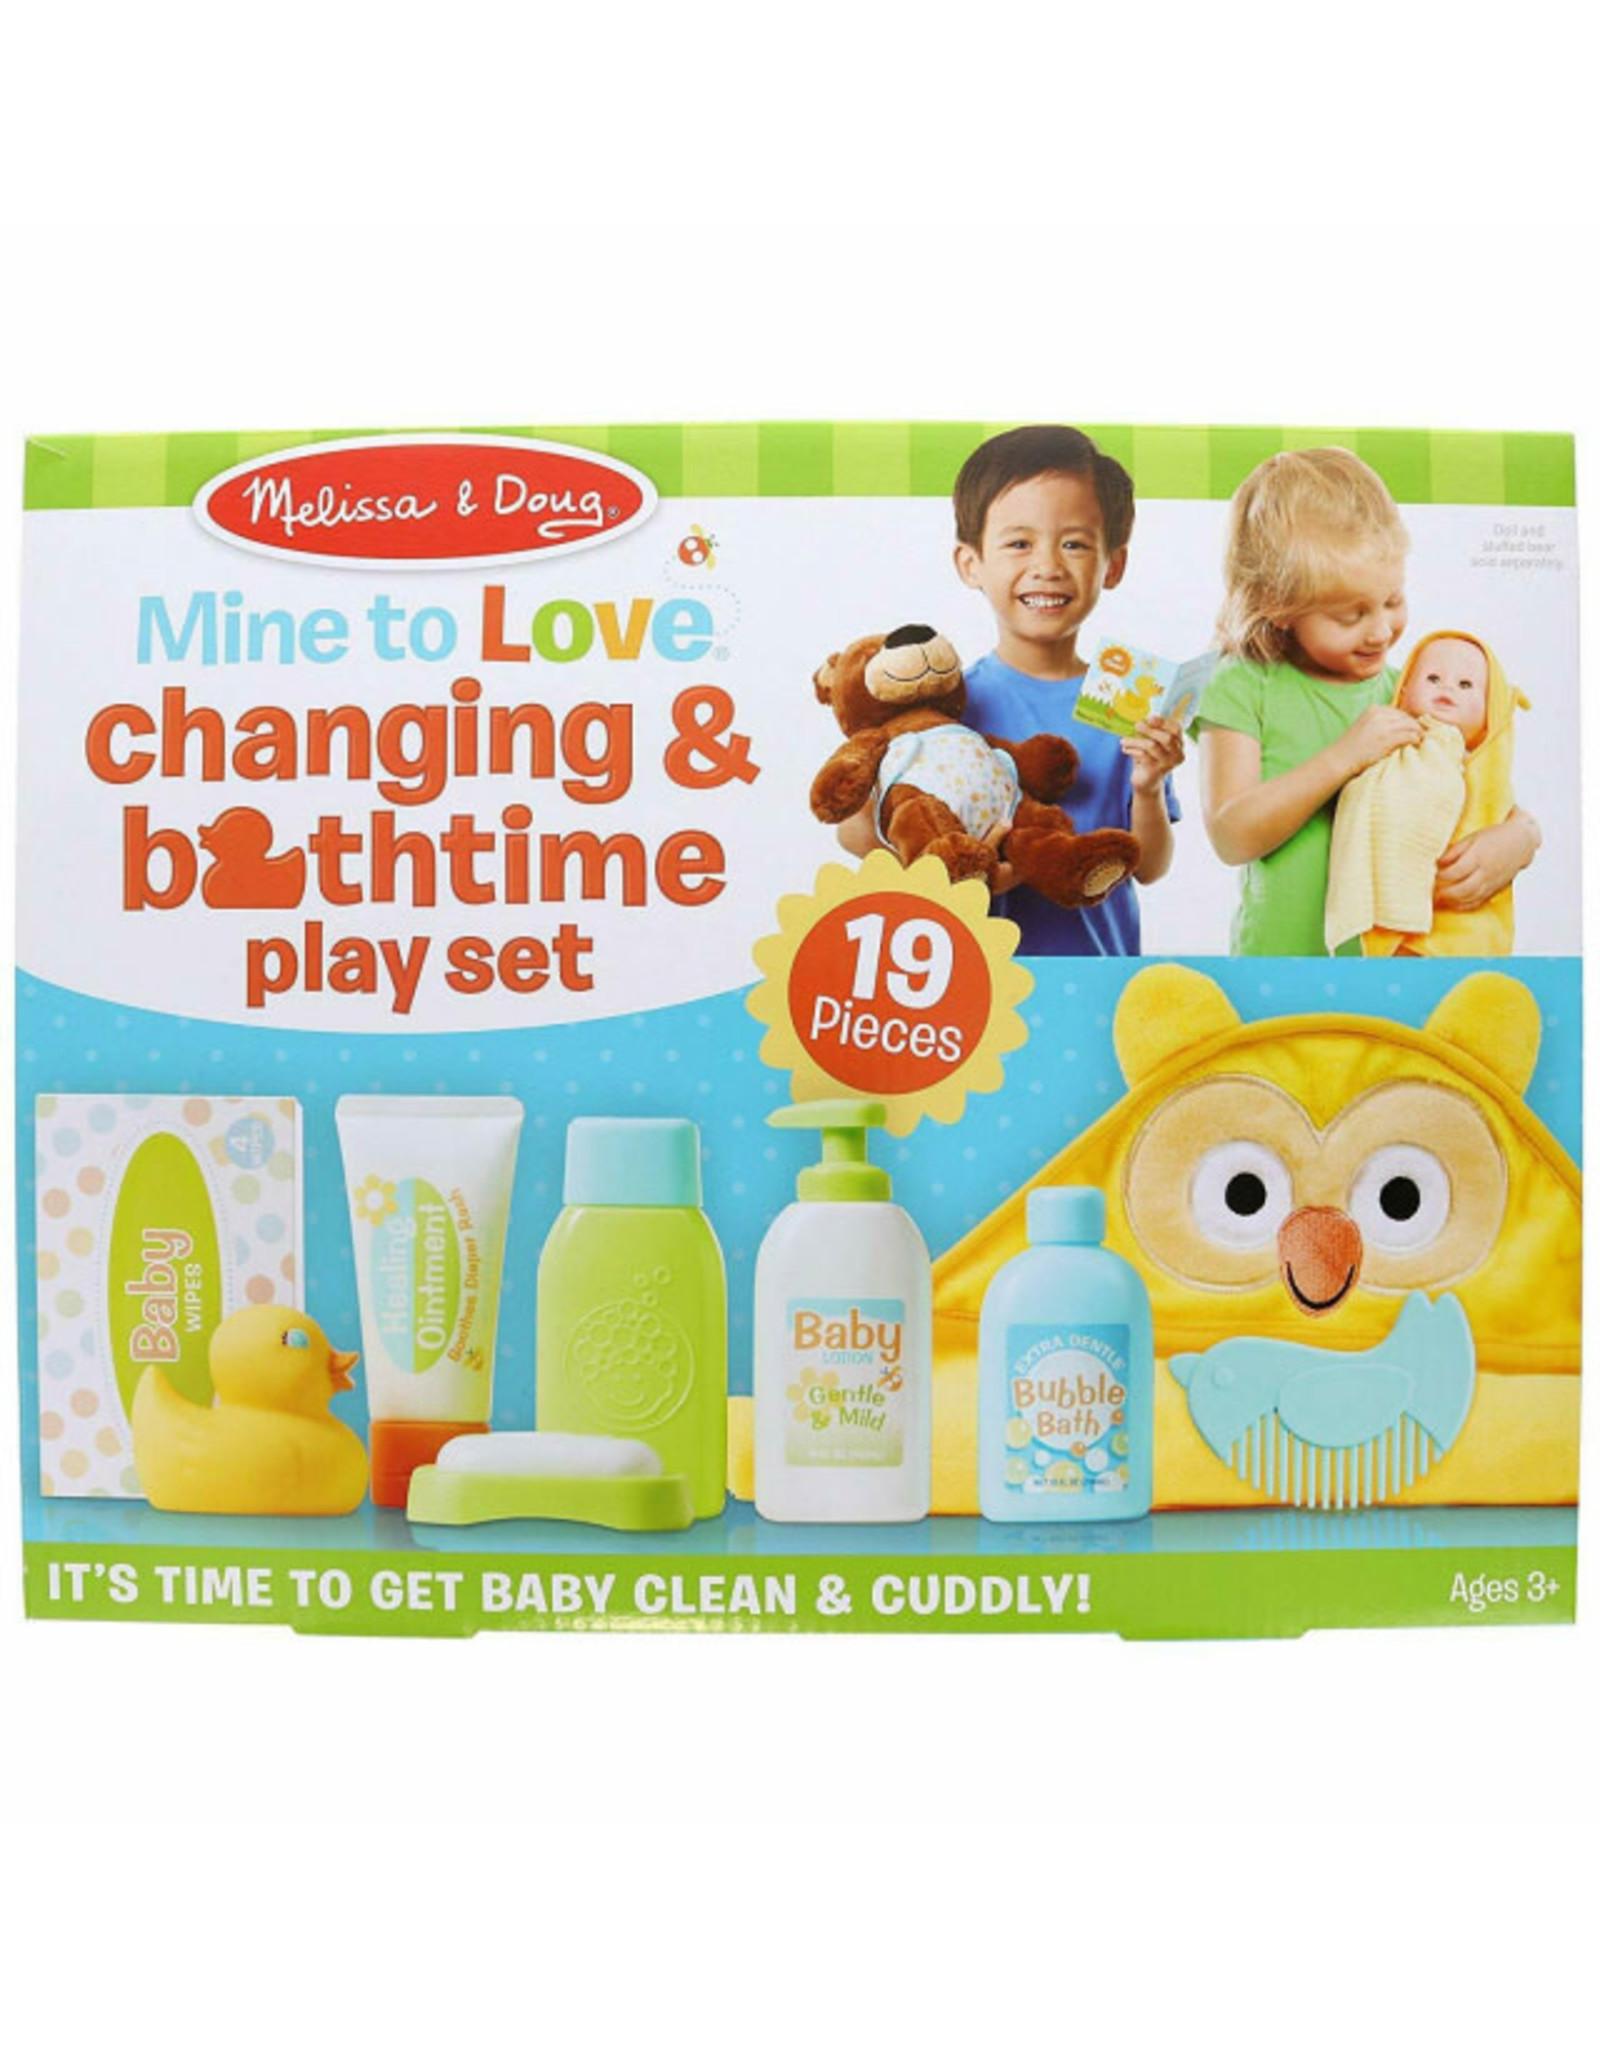 Melissa & Doug Mine to Love Changing & Bathtime Play Set